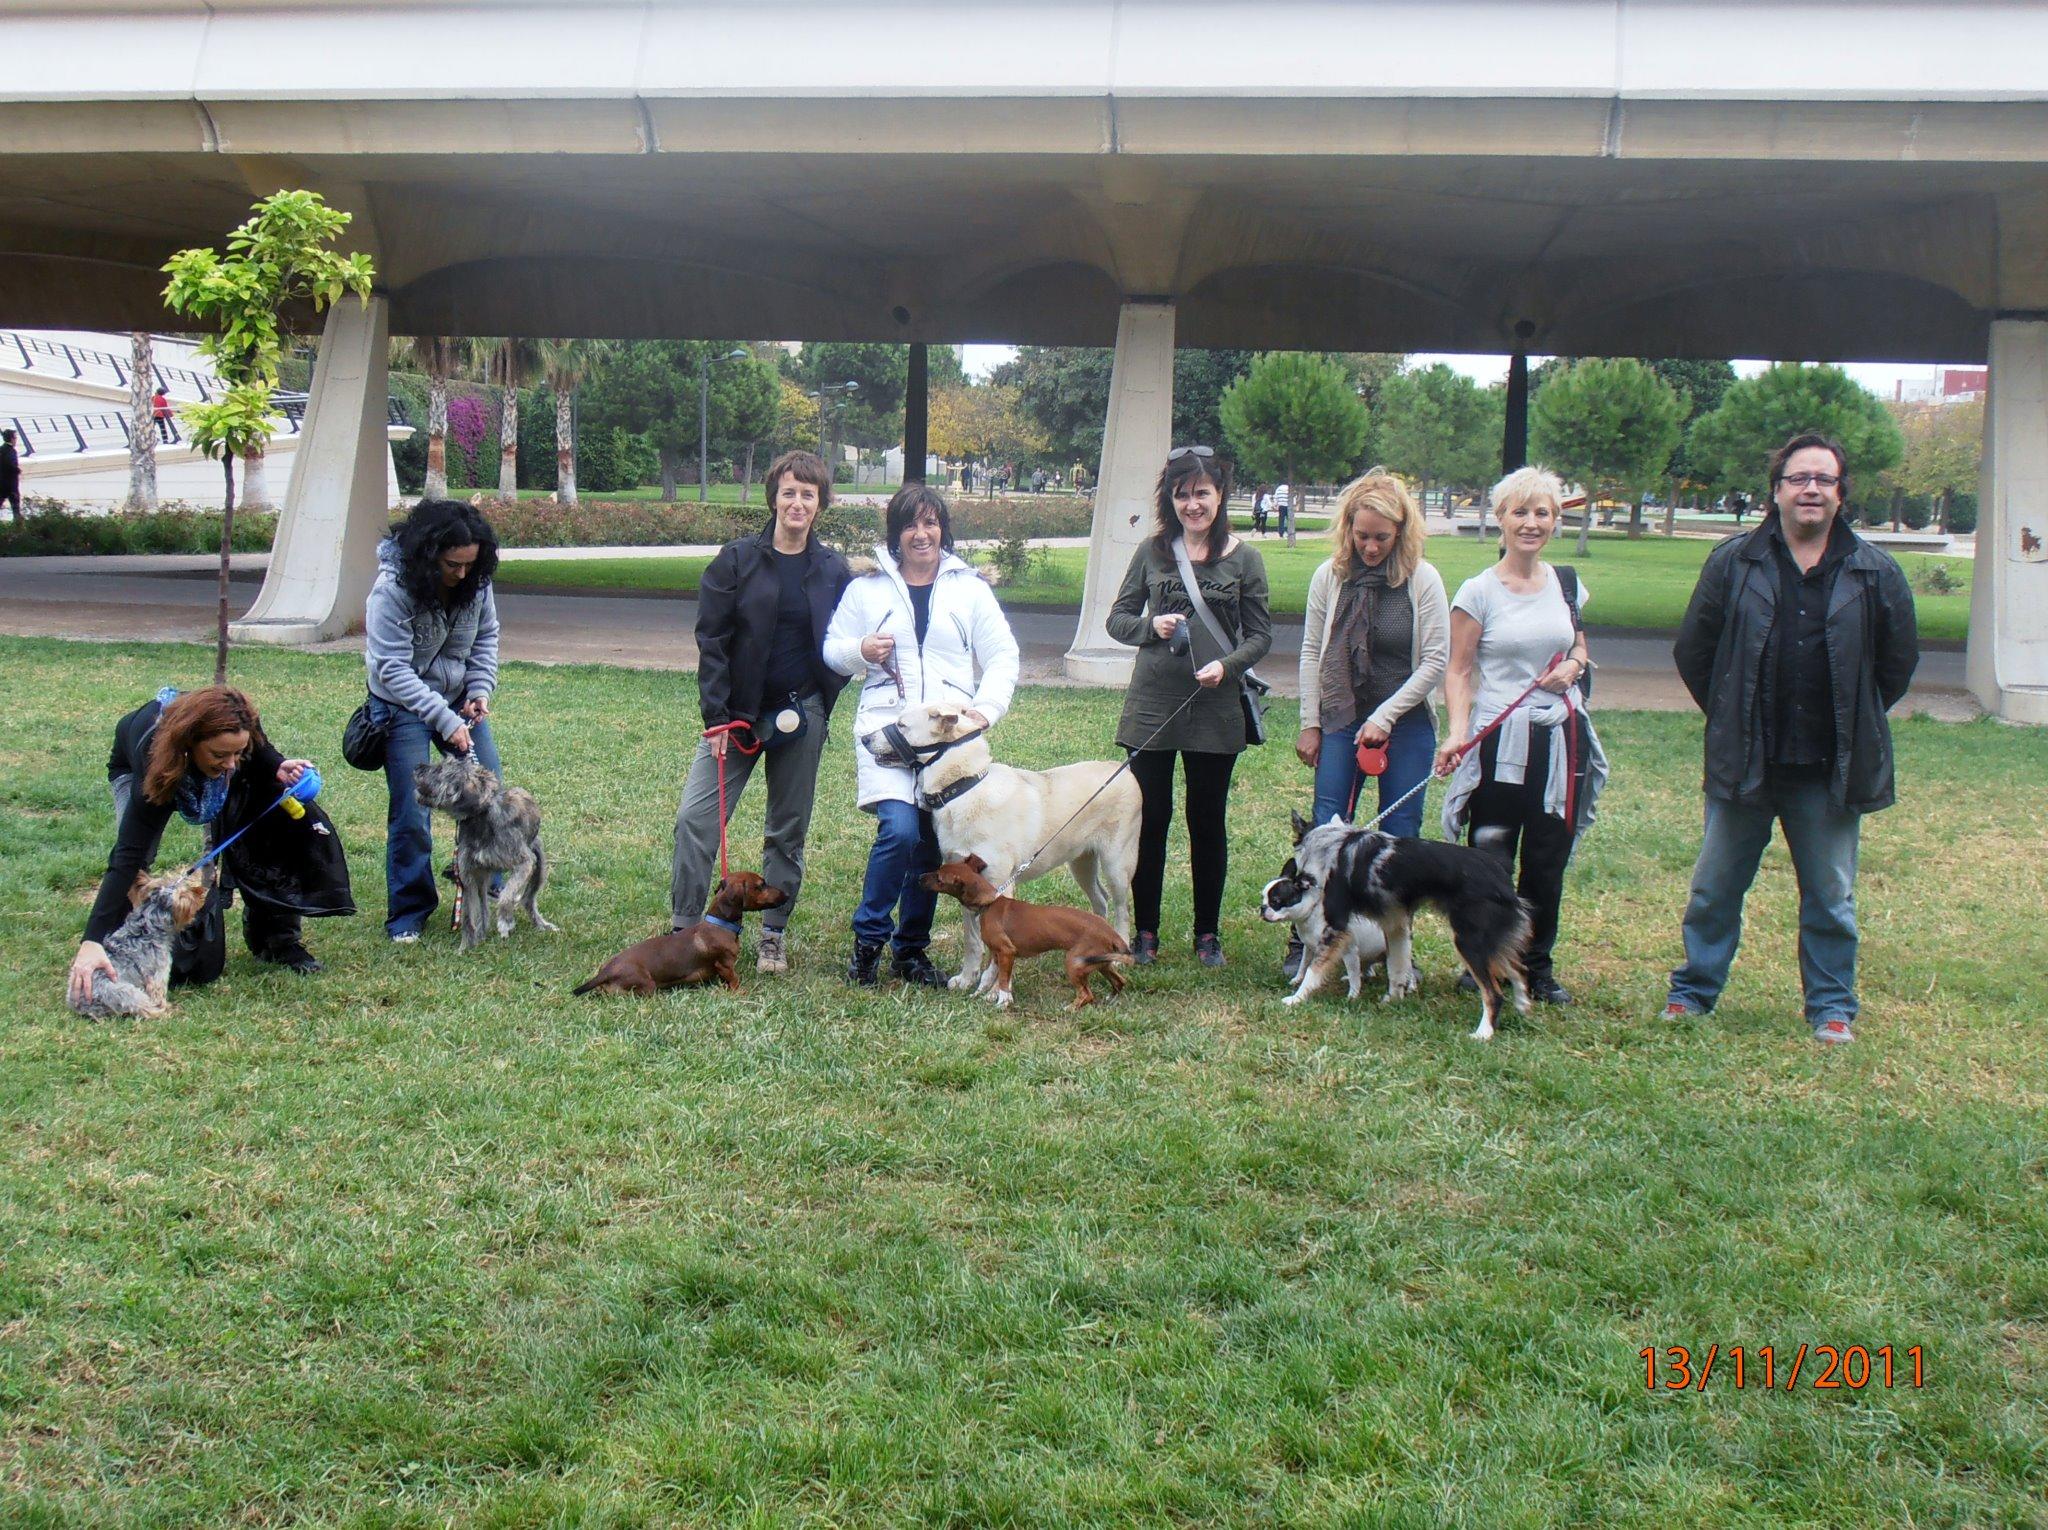 Nacho Roca, ensinistrador de gossos en València